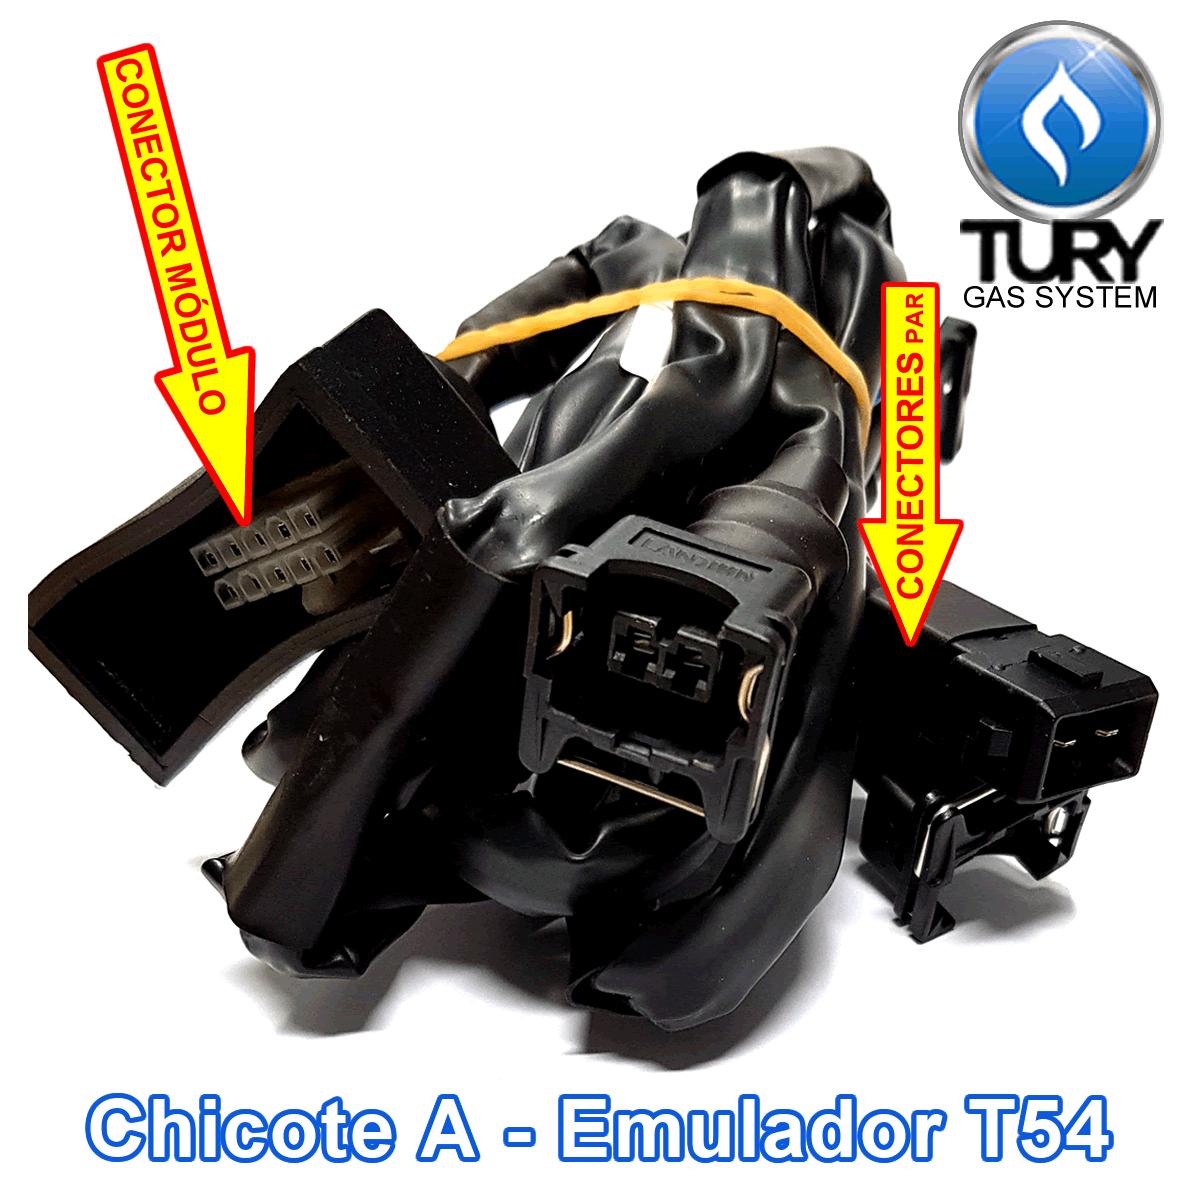 Variador T30 e Emulador de 4 bicos T54 TURY GAS